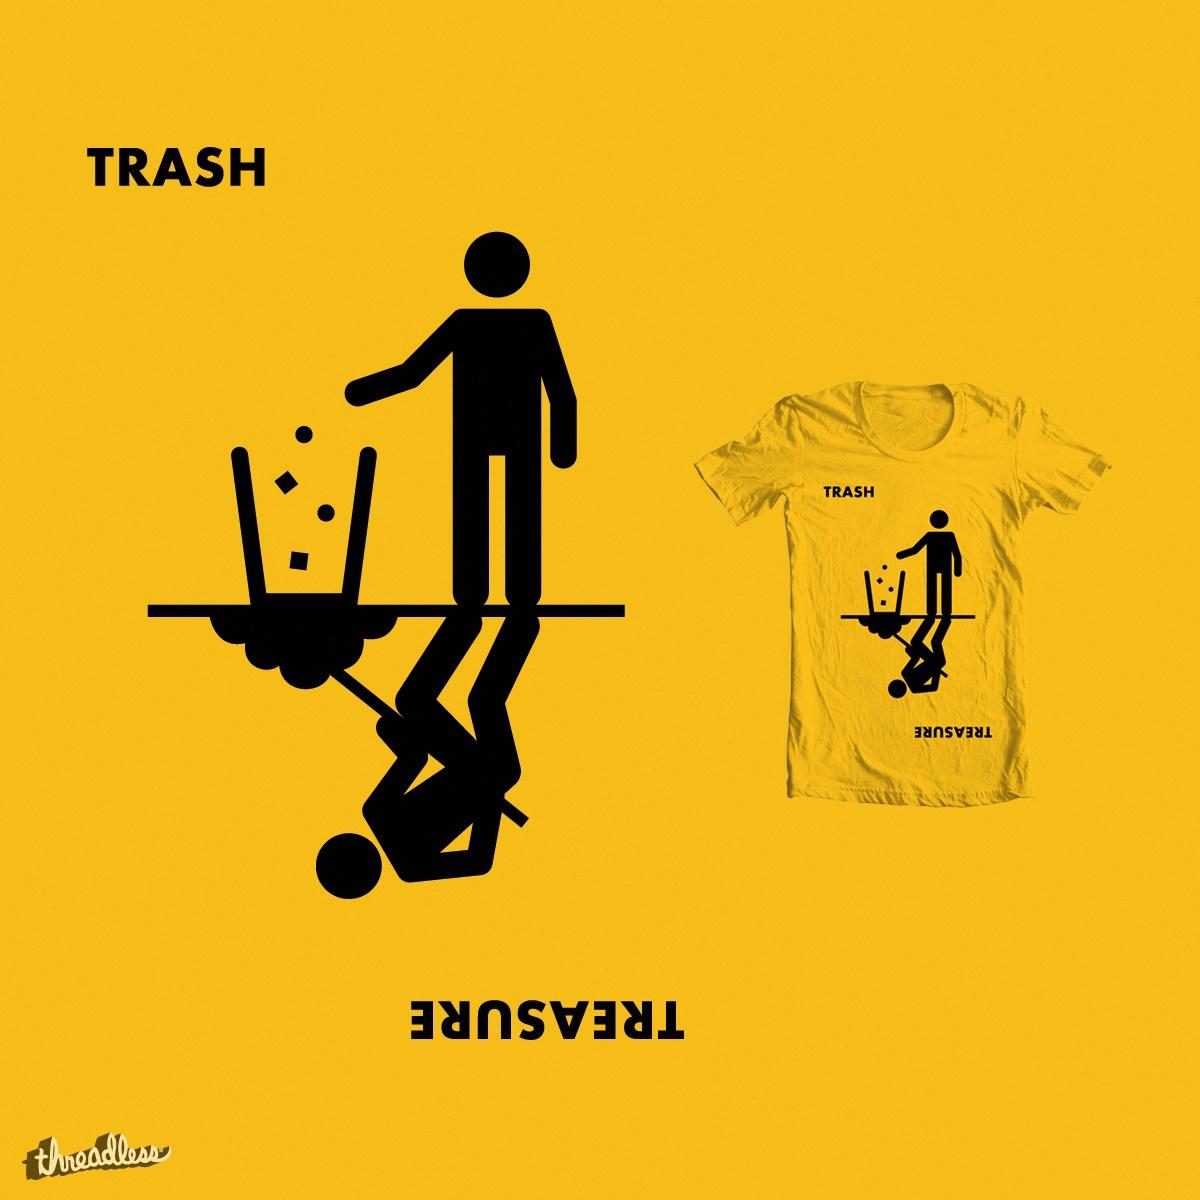 Trash/Treasure by Haasbroek on Threadless